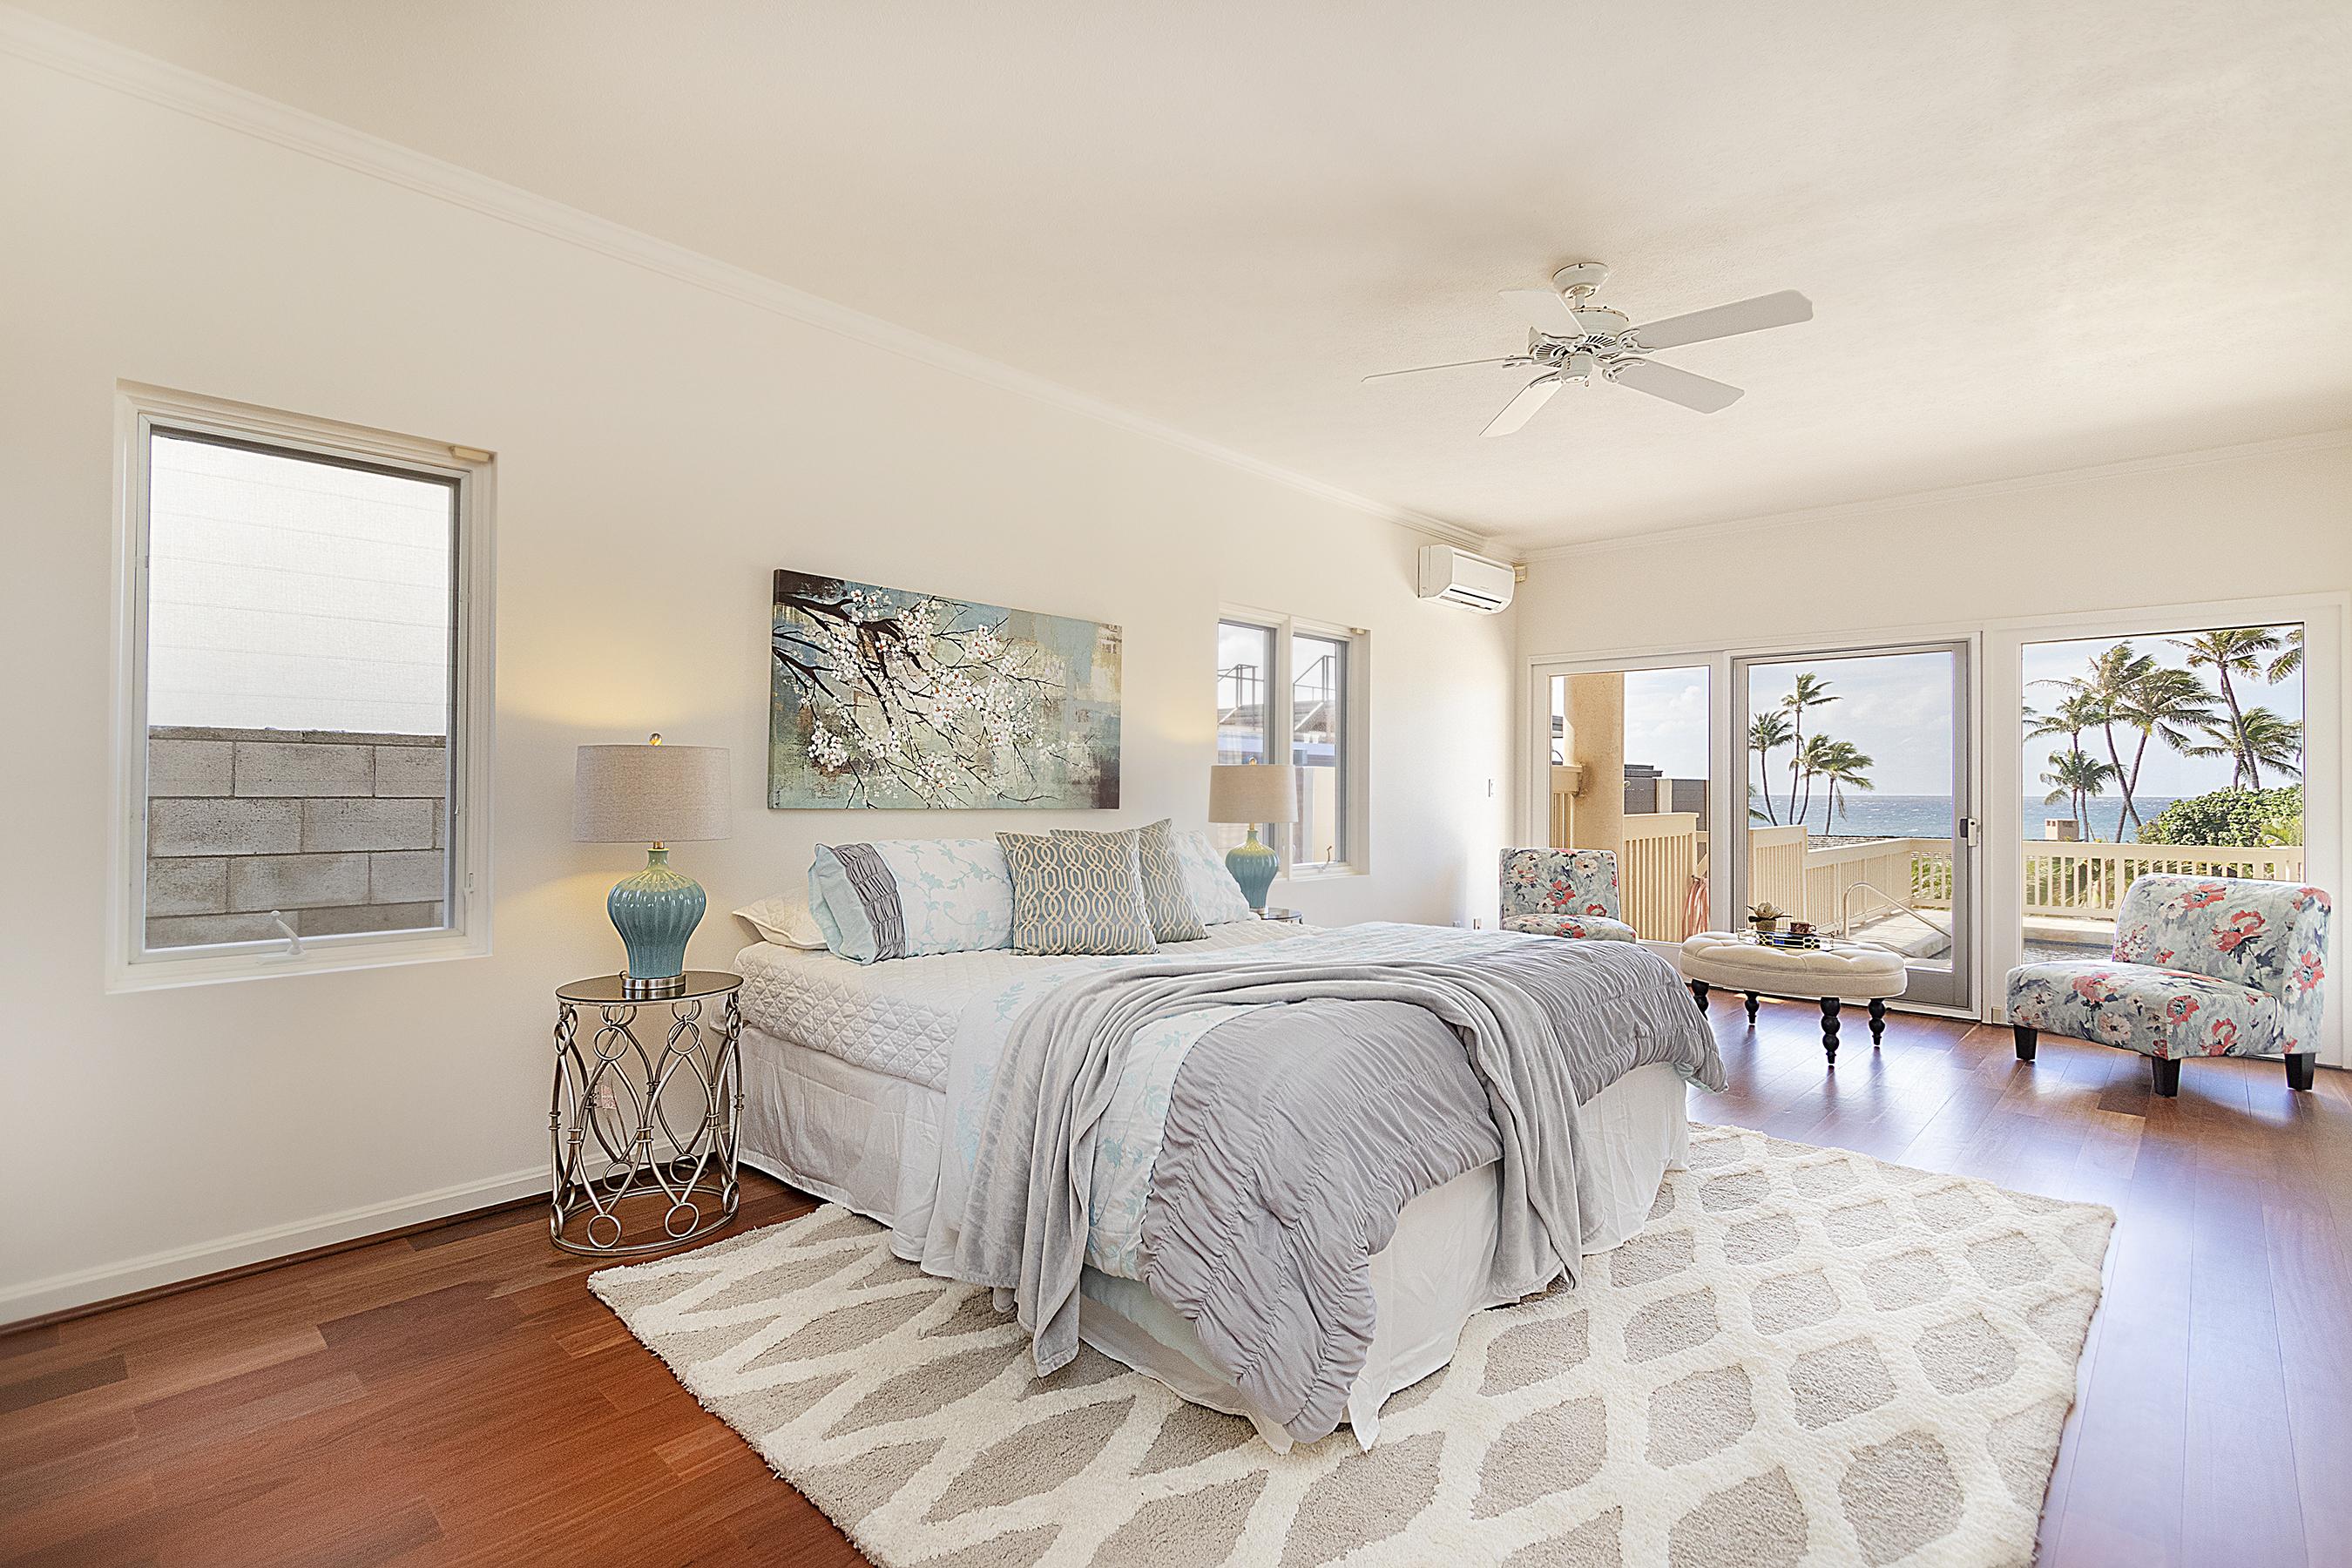 Bedroom two at 4323 Kaikoo Place, Honolulu, HI 96816